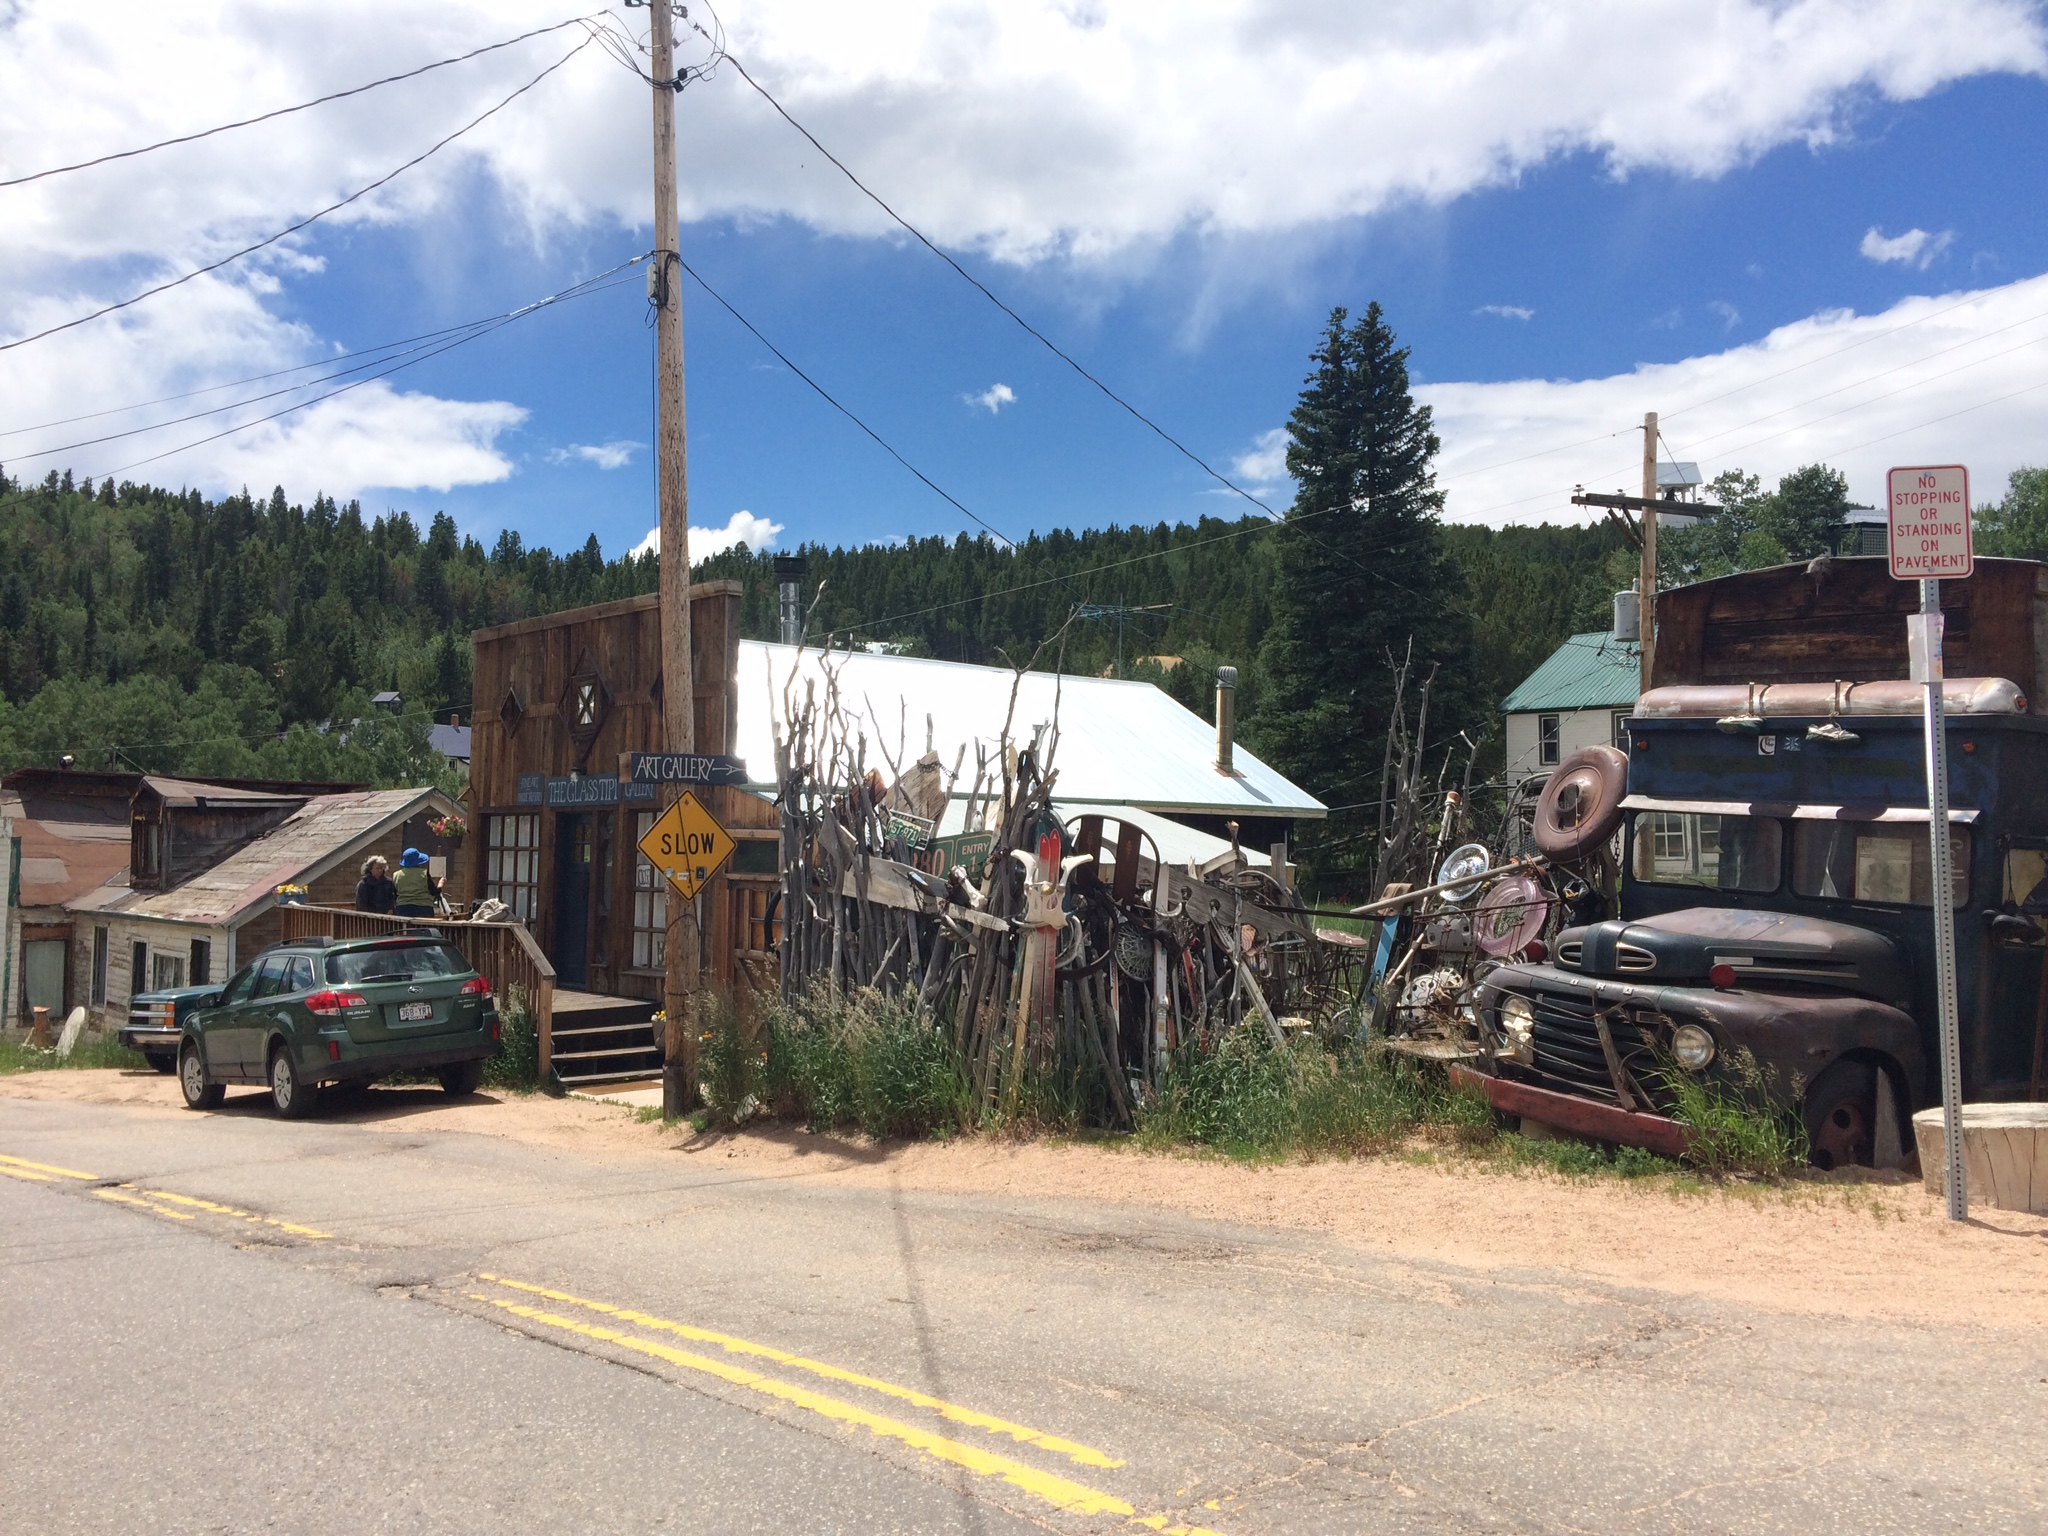 Rode through the weirdest town in Boulder County,Ward.